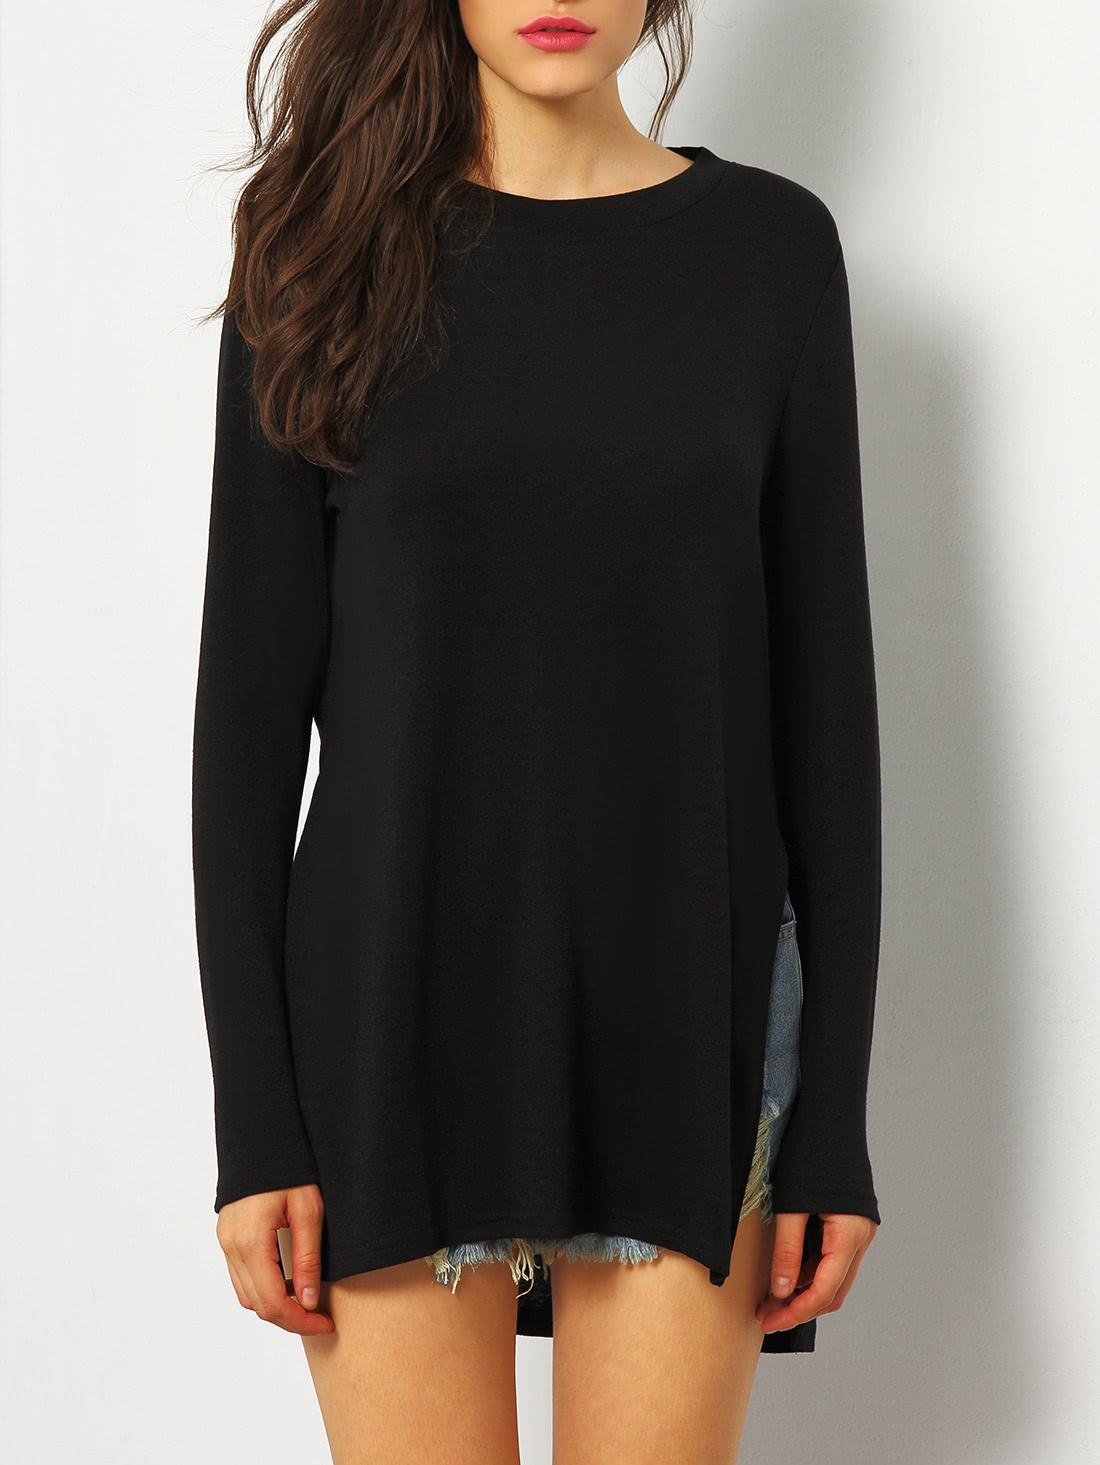 Black Dip Hem Split Side Casual T-shirt tee151210582